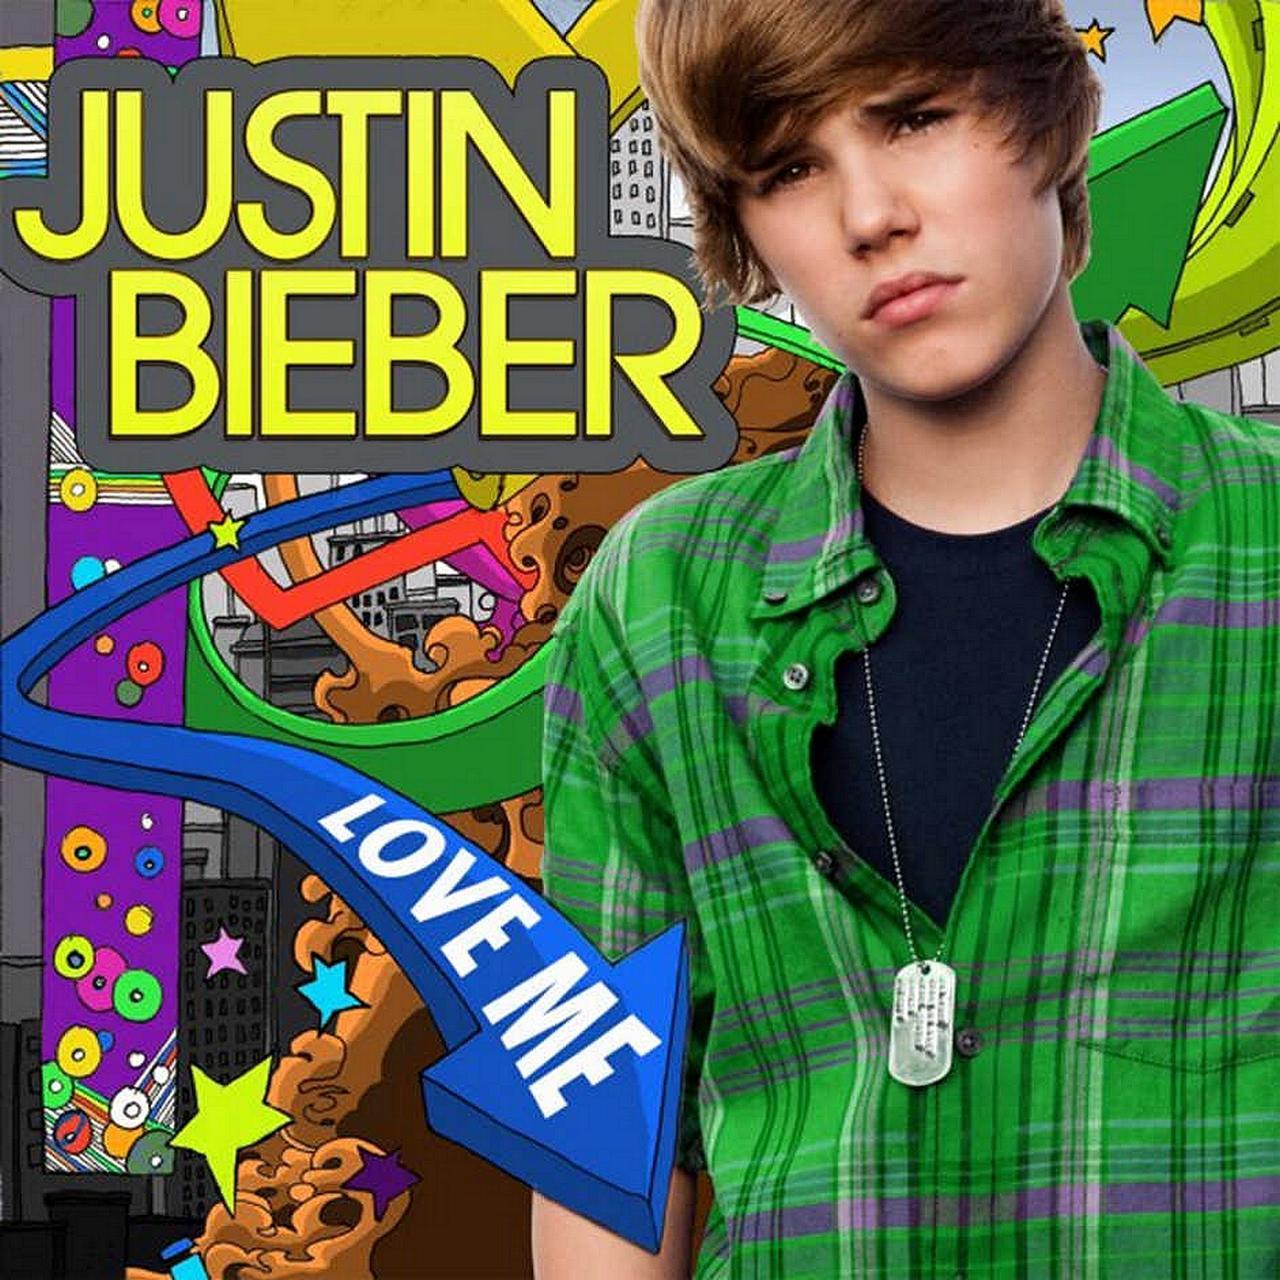 Justin Bieber - Love Me mp3 download